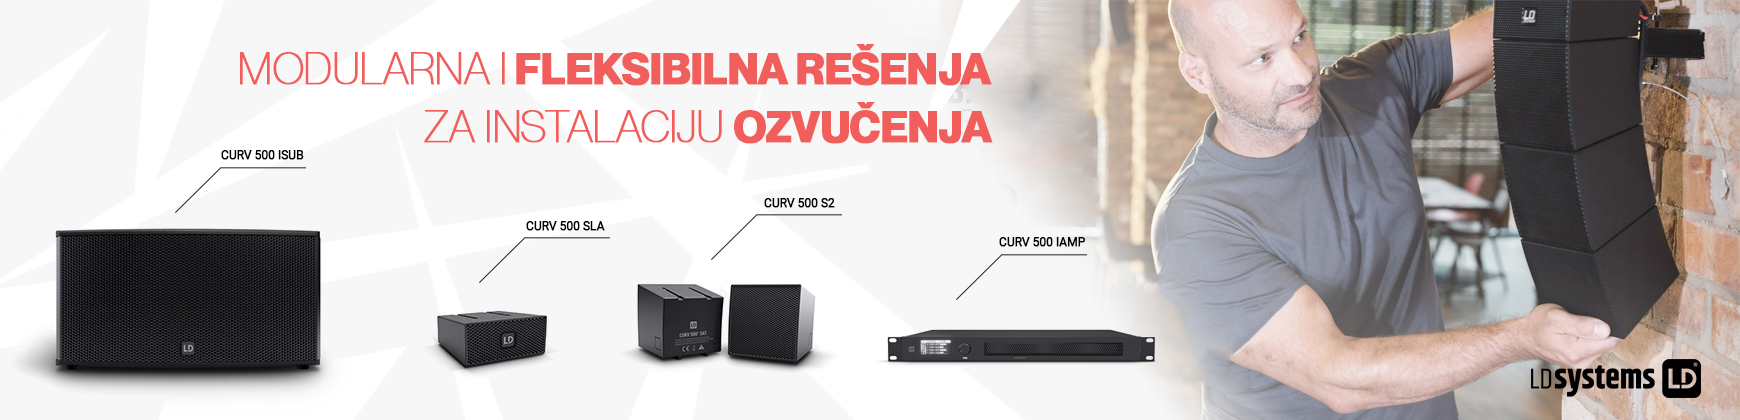 CURV 500® instalacioni zvučnici